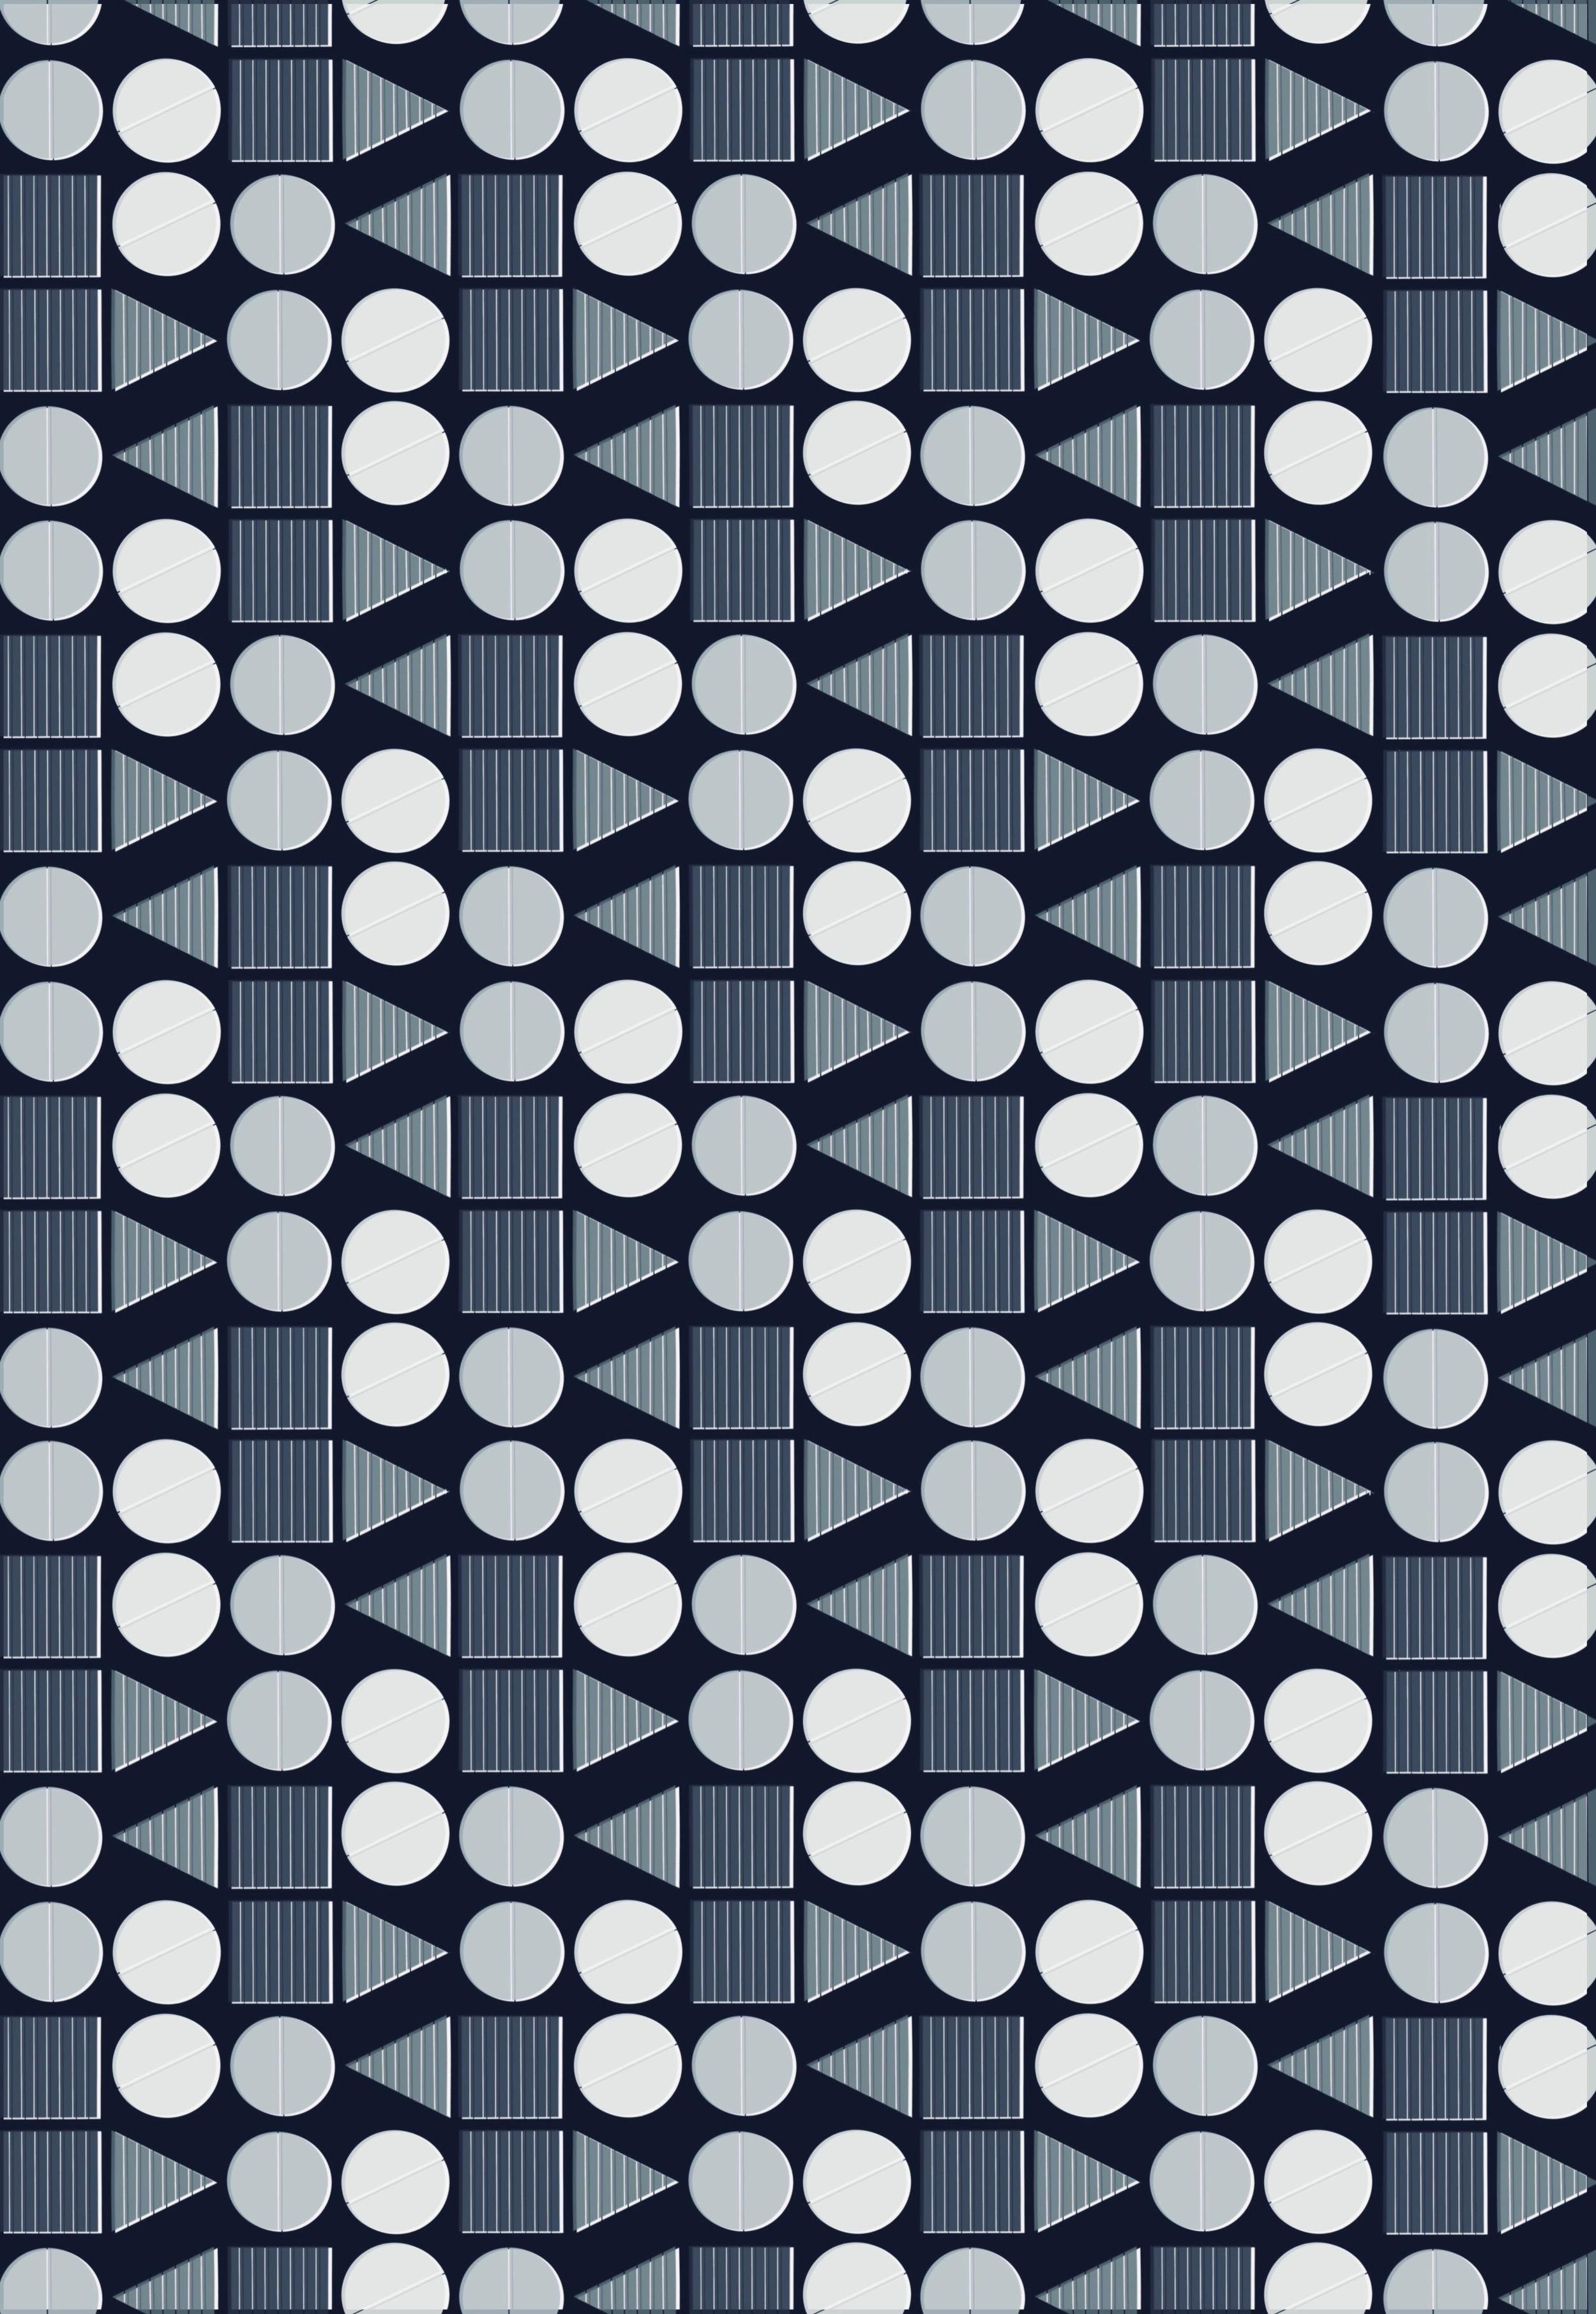 Surface Design 057.jpg